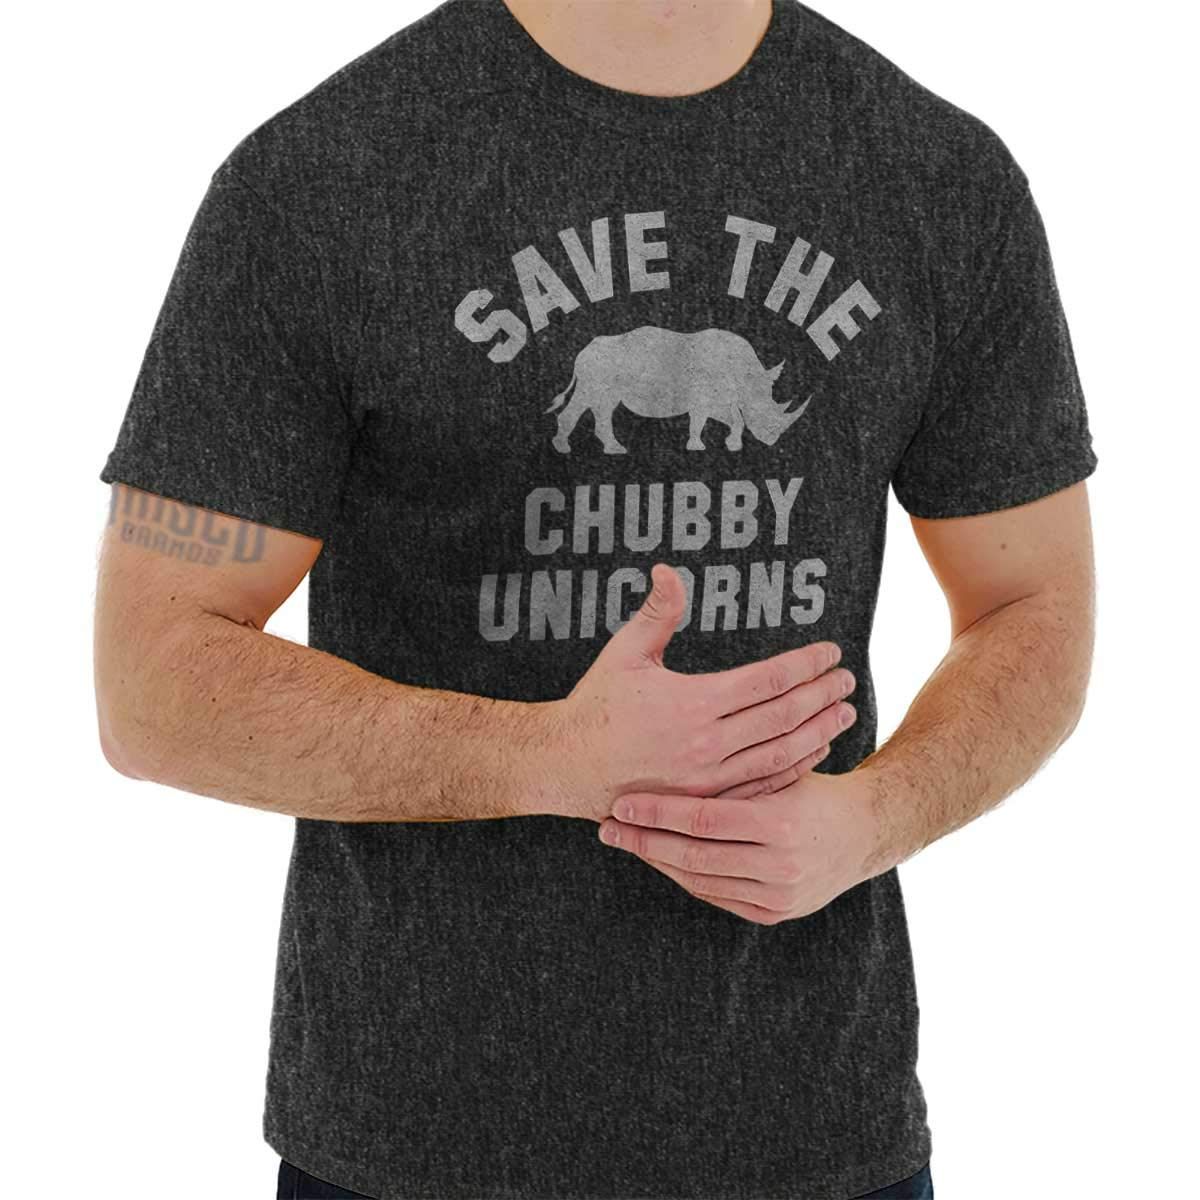 Save Chubby Unicorns Funny Shirt Rhino Hipster Gift Idea Cool T-Shirt Tee